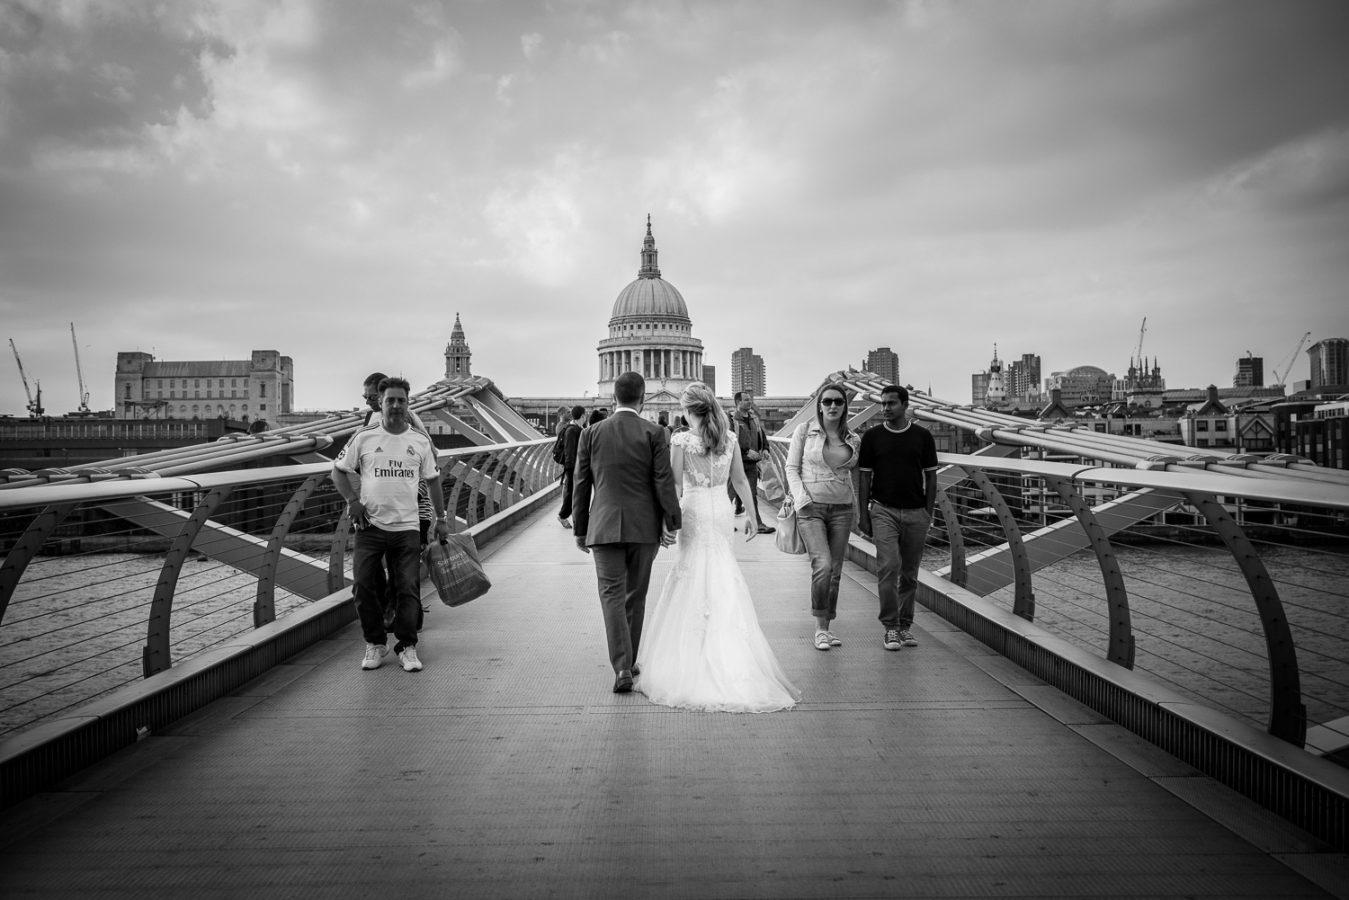 Swan-at-shakespeare-globe-wedding-photography-153